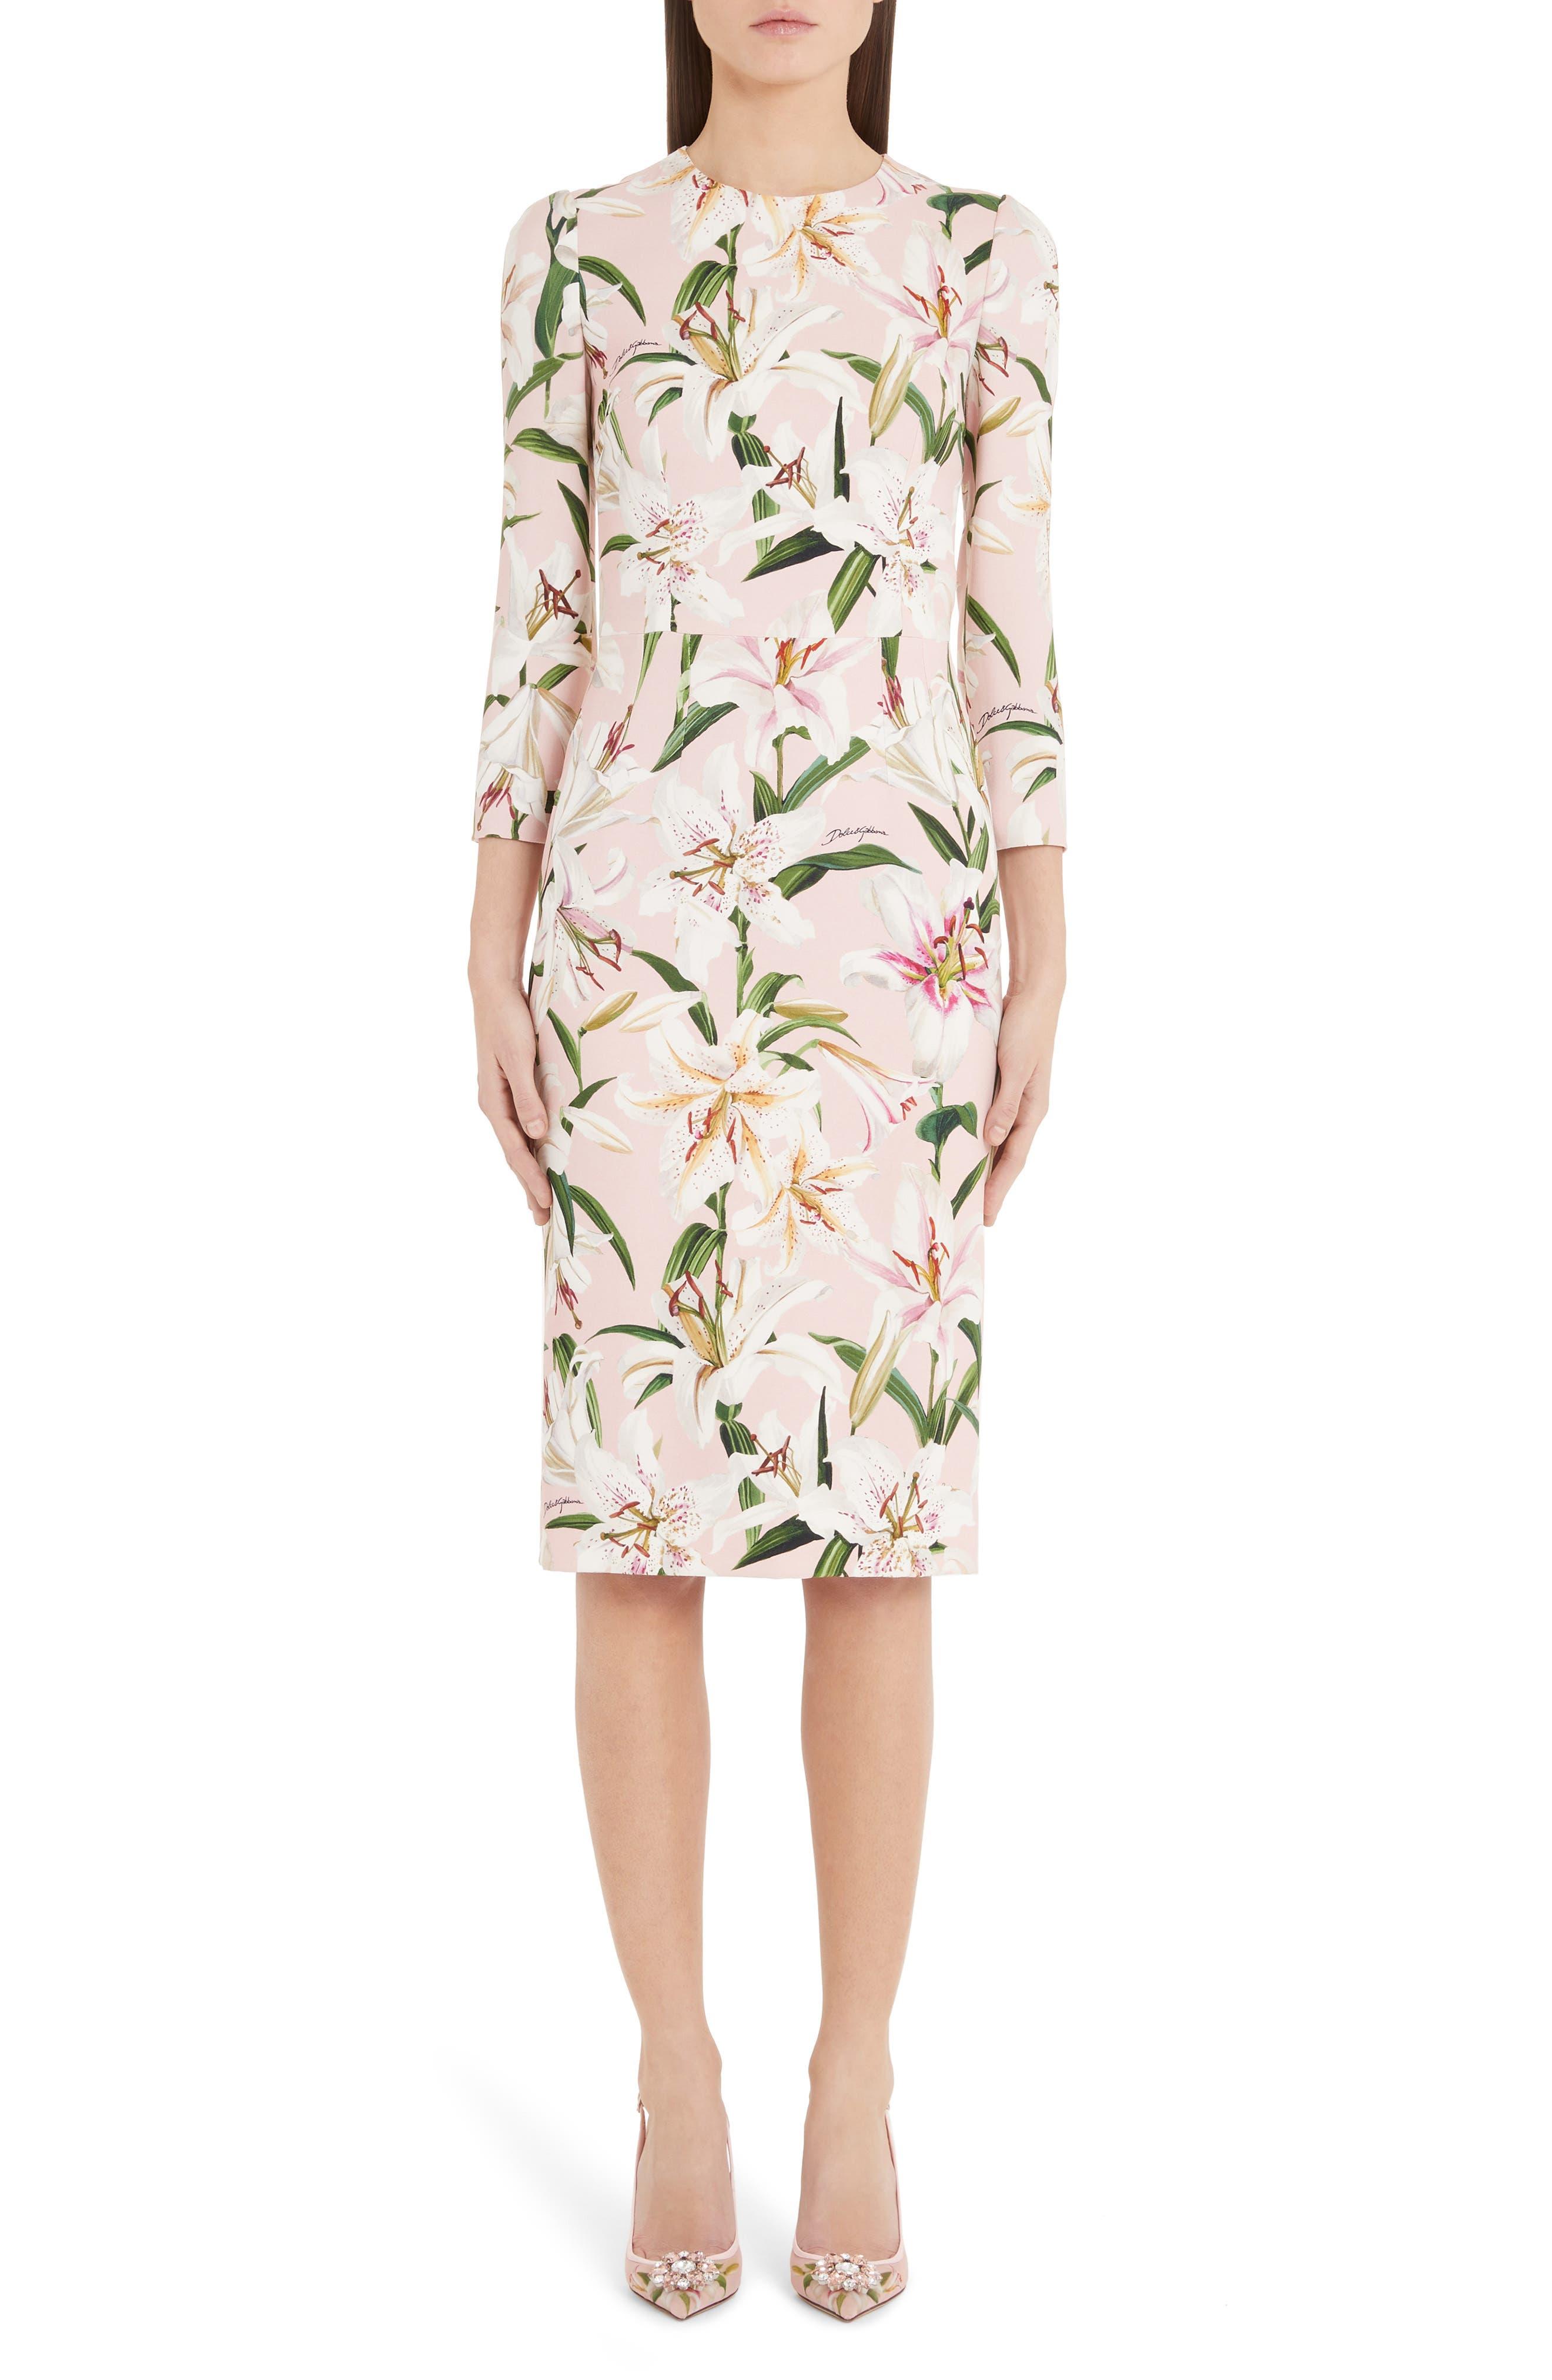 Dolce & gabbana Lily Print Sheath Dress, US / 44 IT - Pink